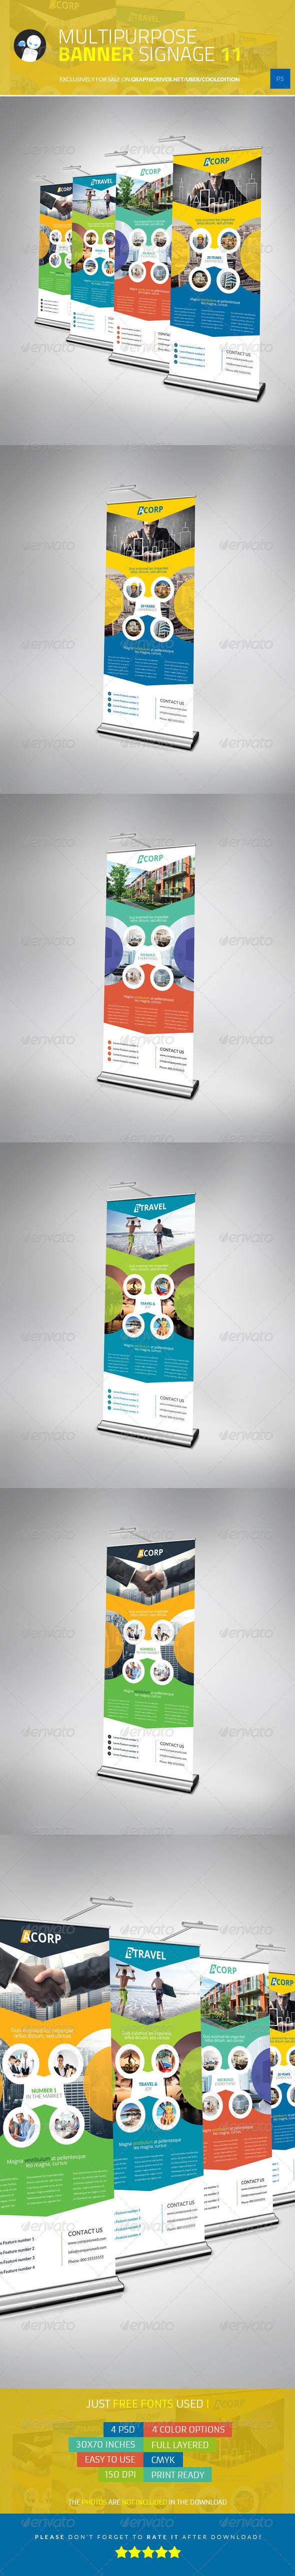 Multipurpose Banner Signage 11 - Signage Print Templates